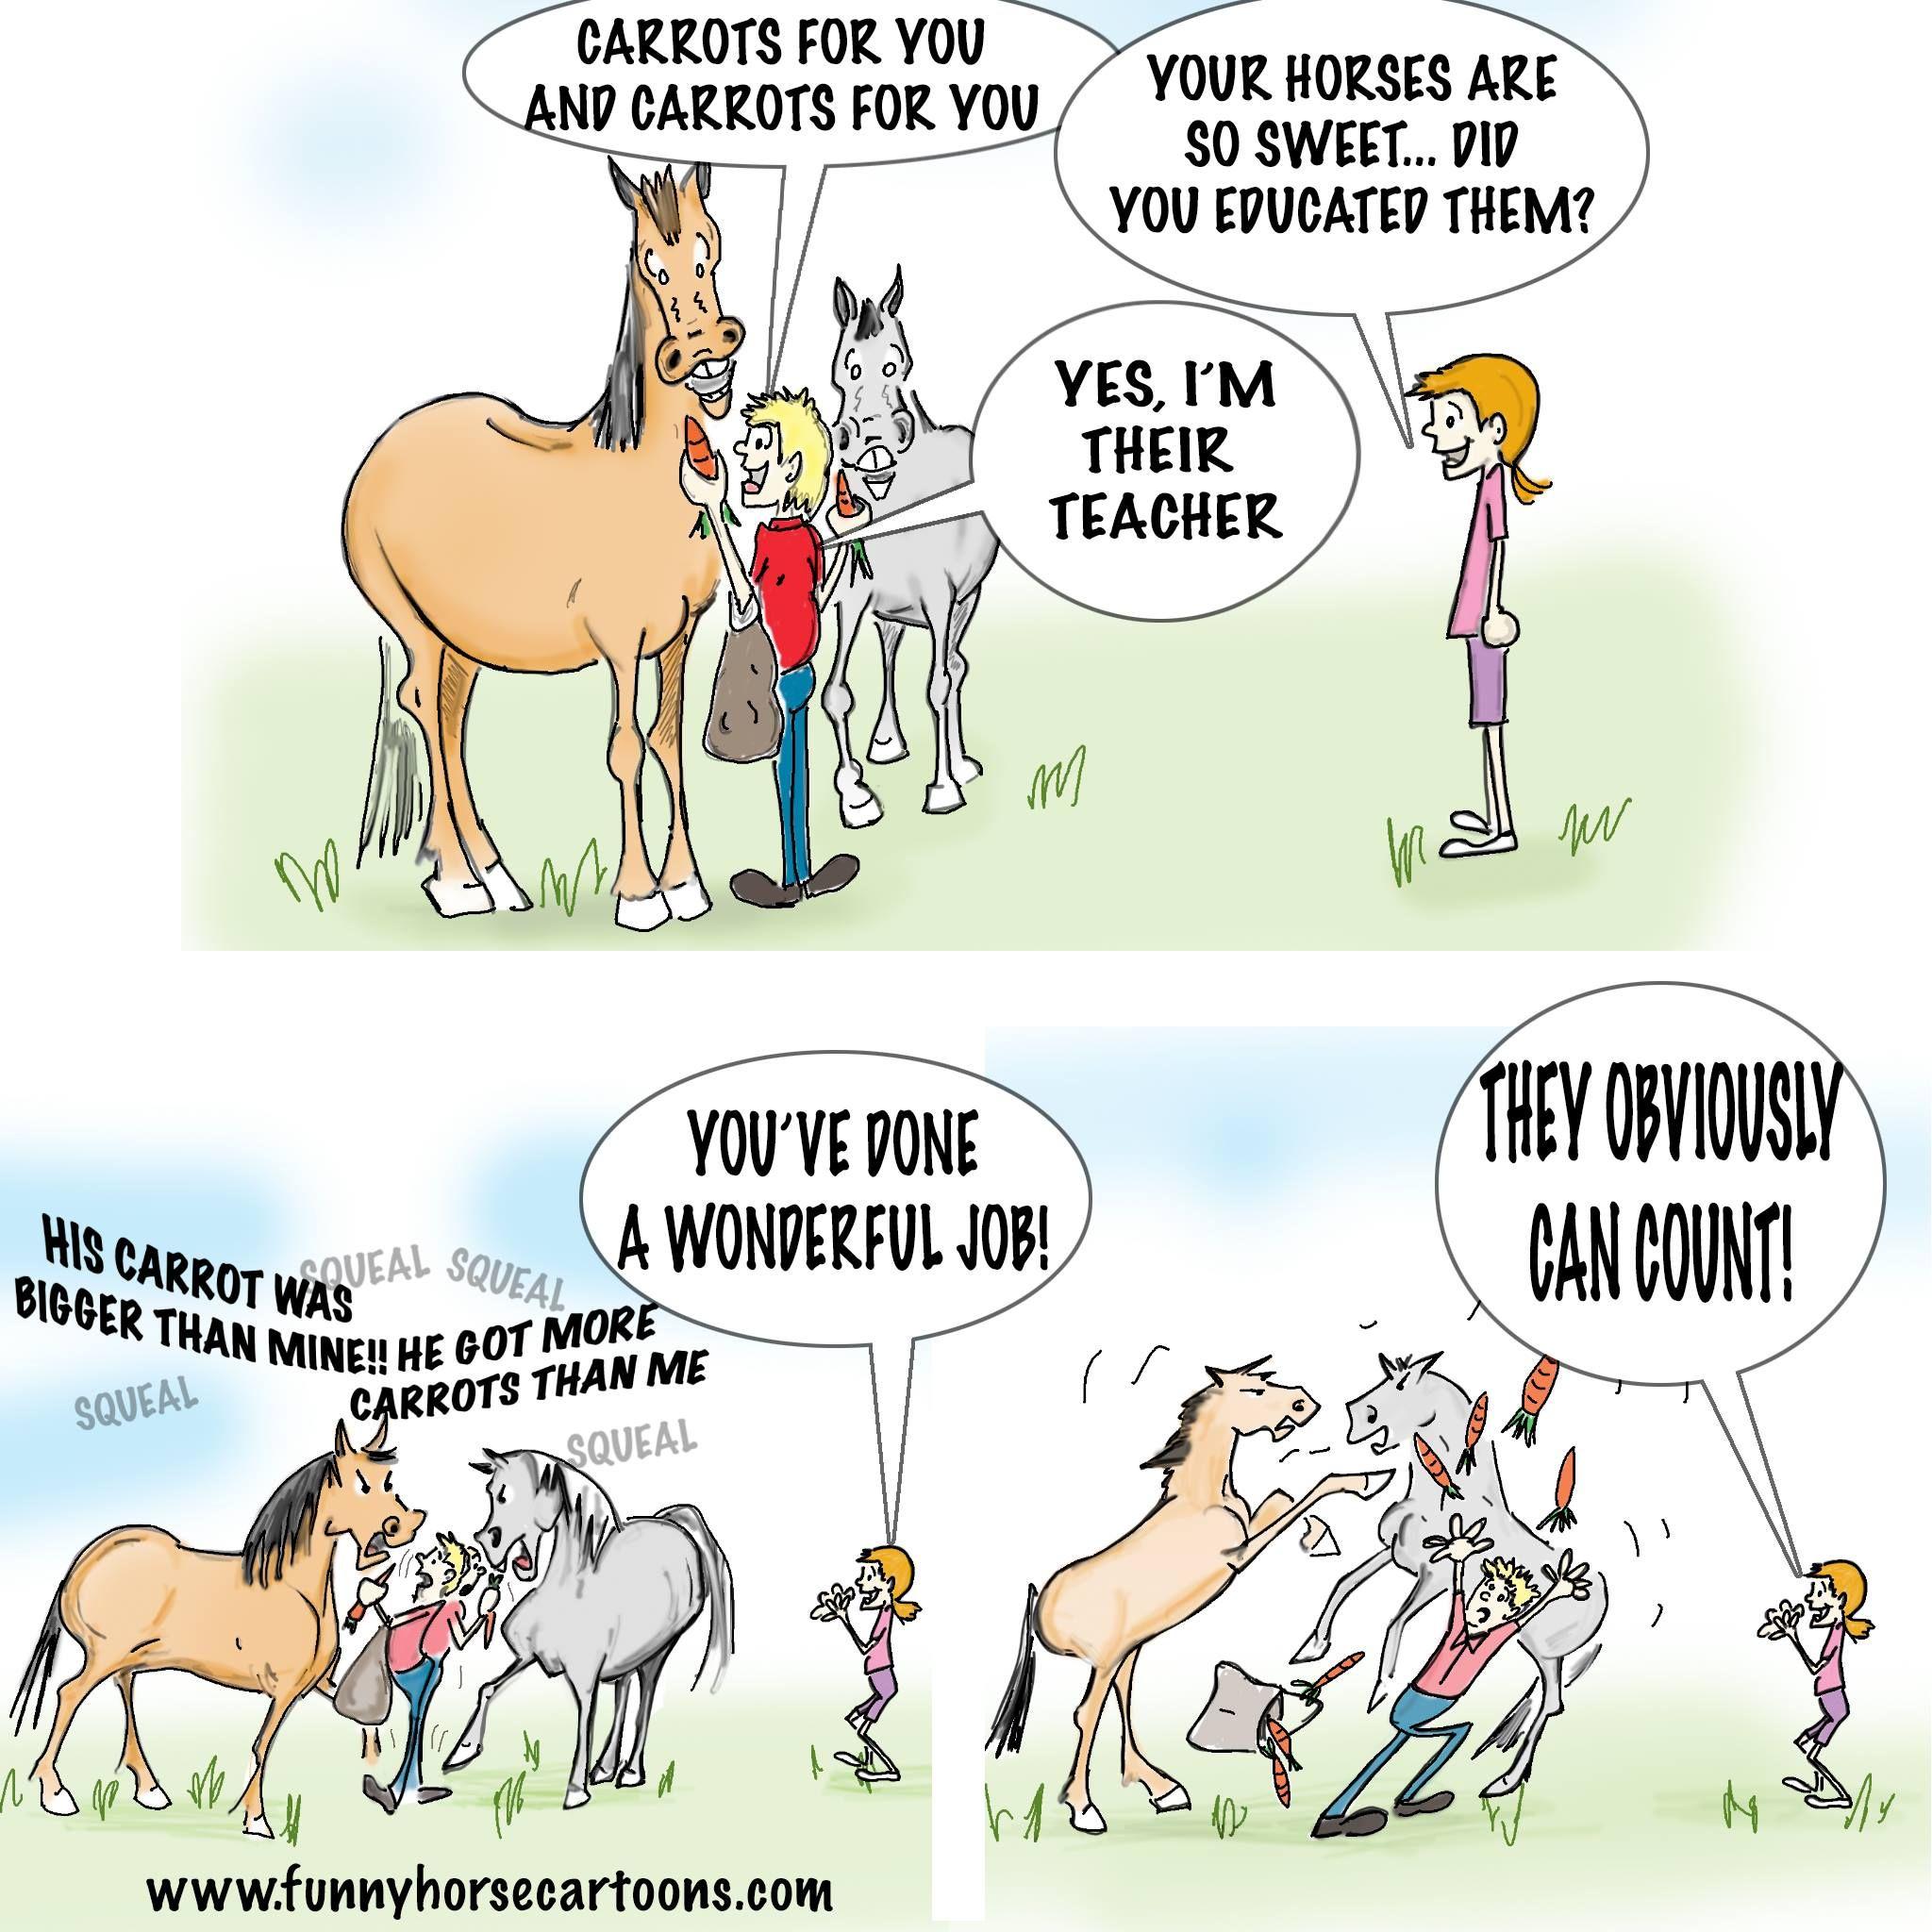 Funny Horse Cartoons | Horsey Humor | Pinterest | Horse ...